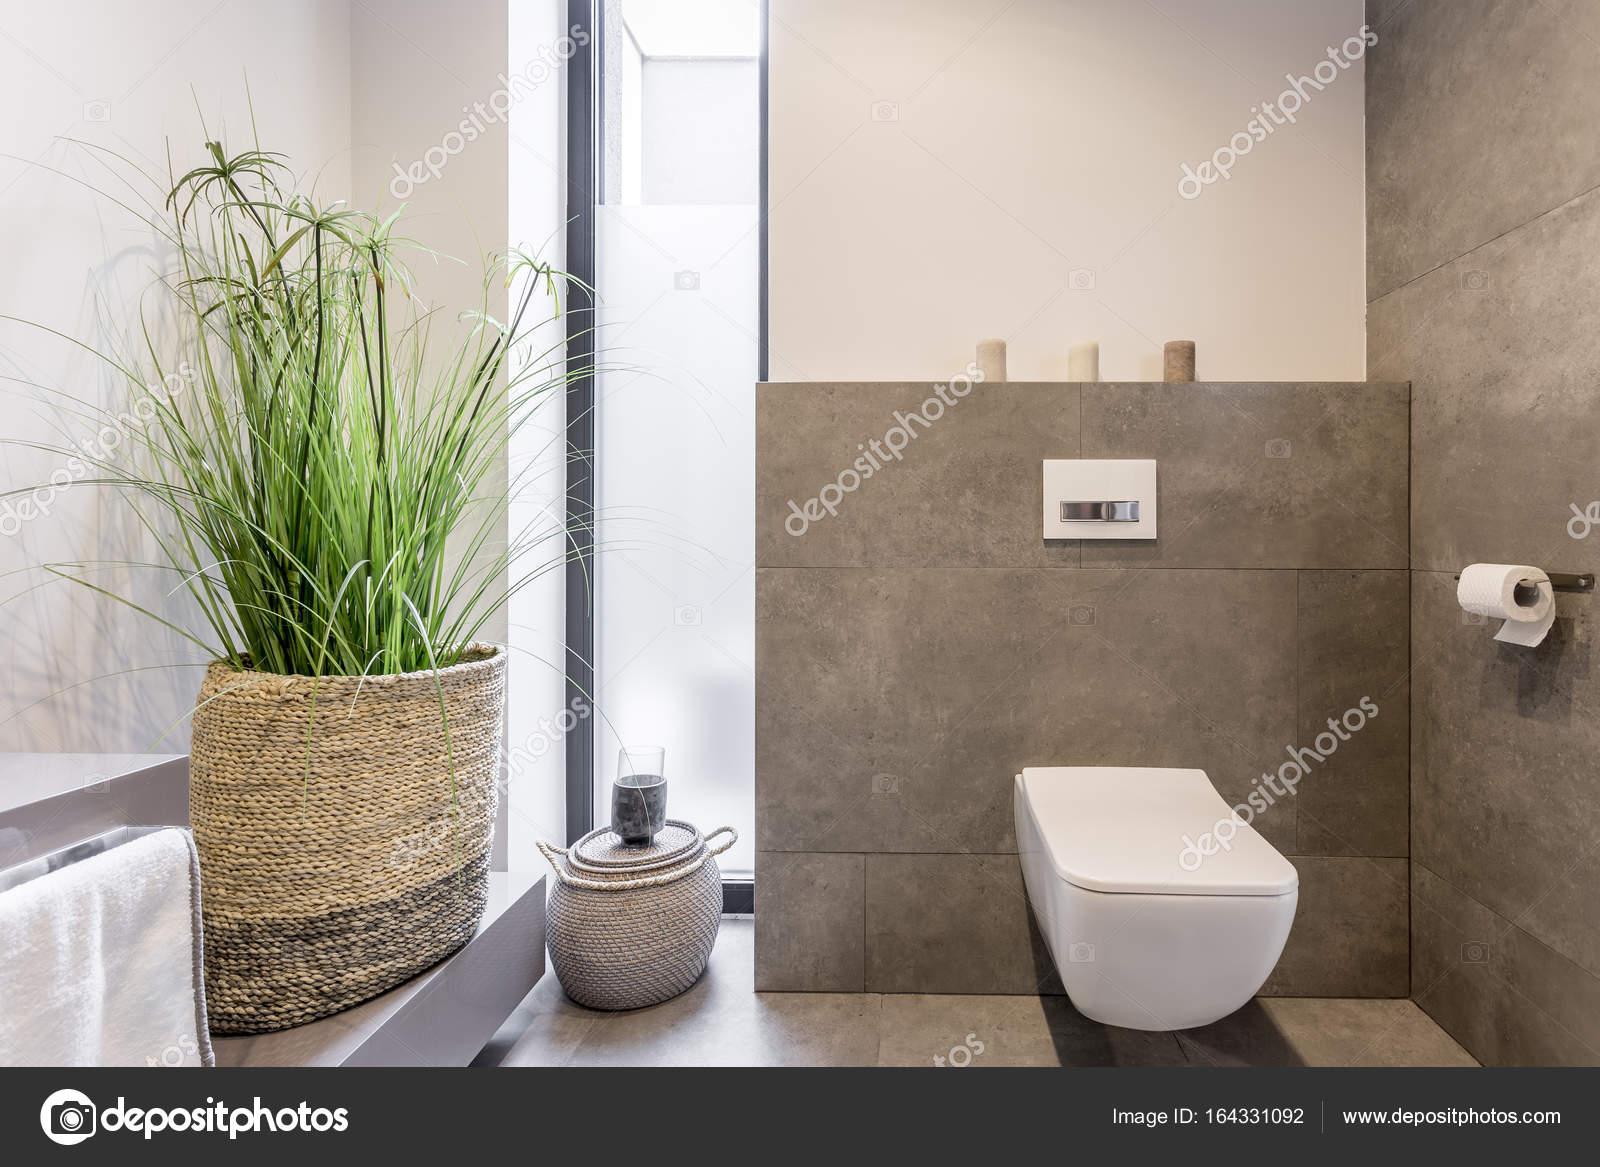 Minimalistische toilette design u stockfoto photographee eu